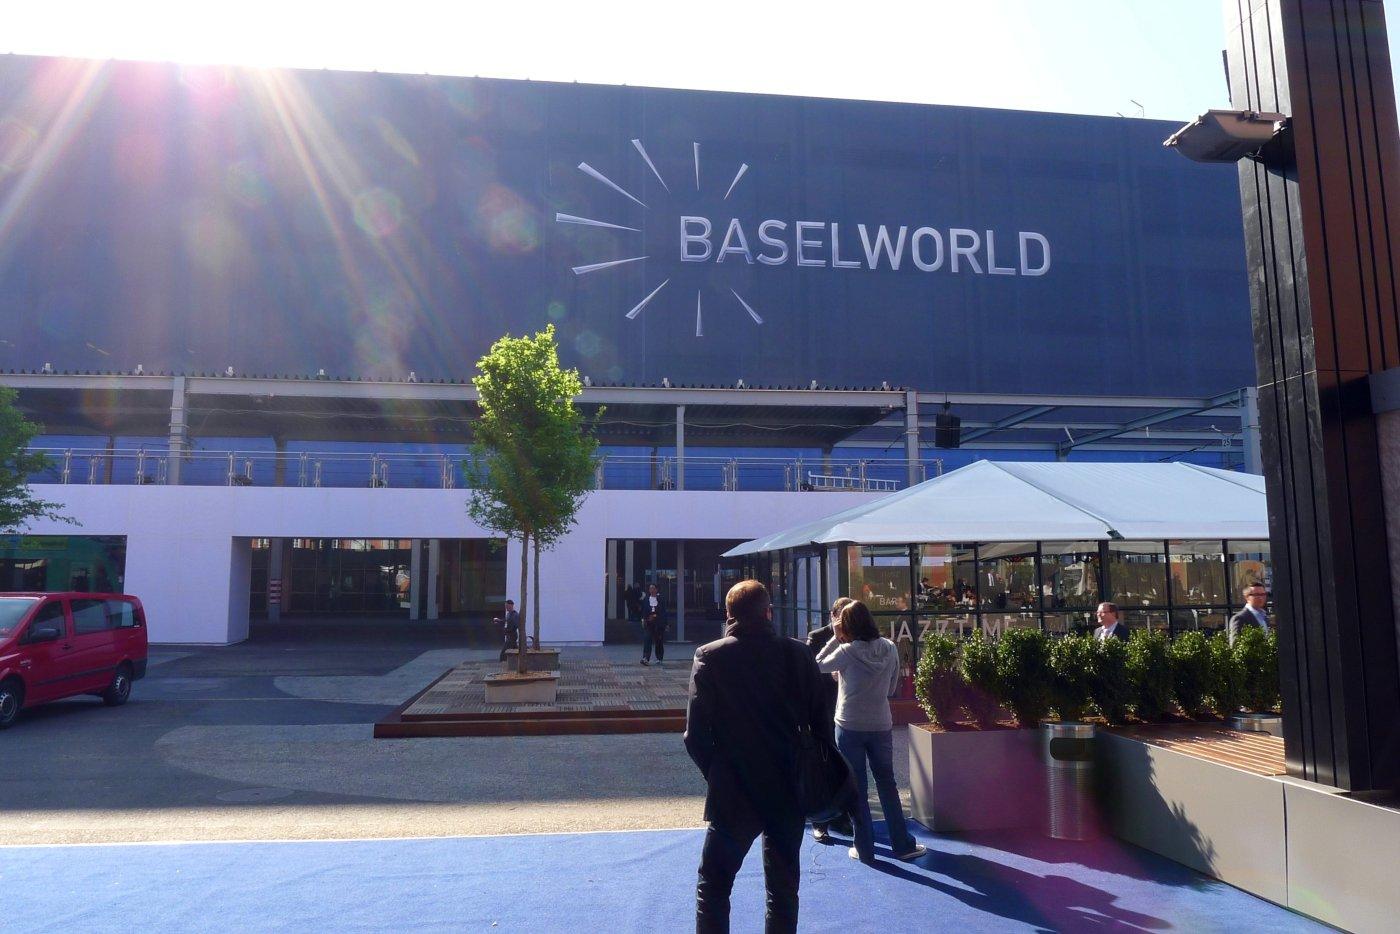 Baselworld 2011